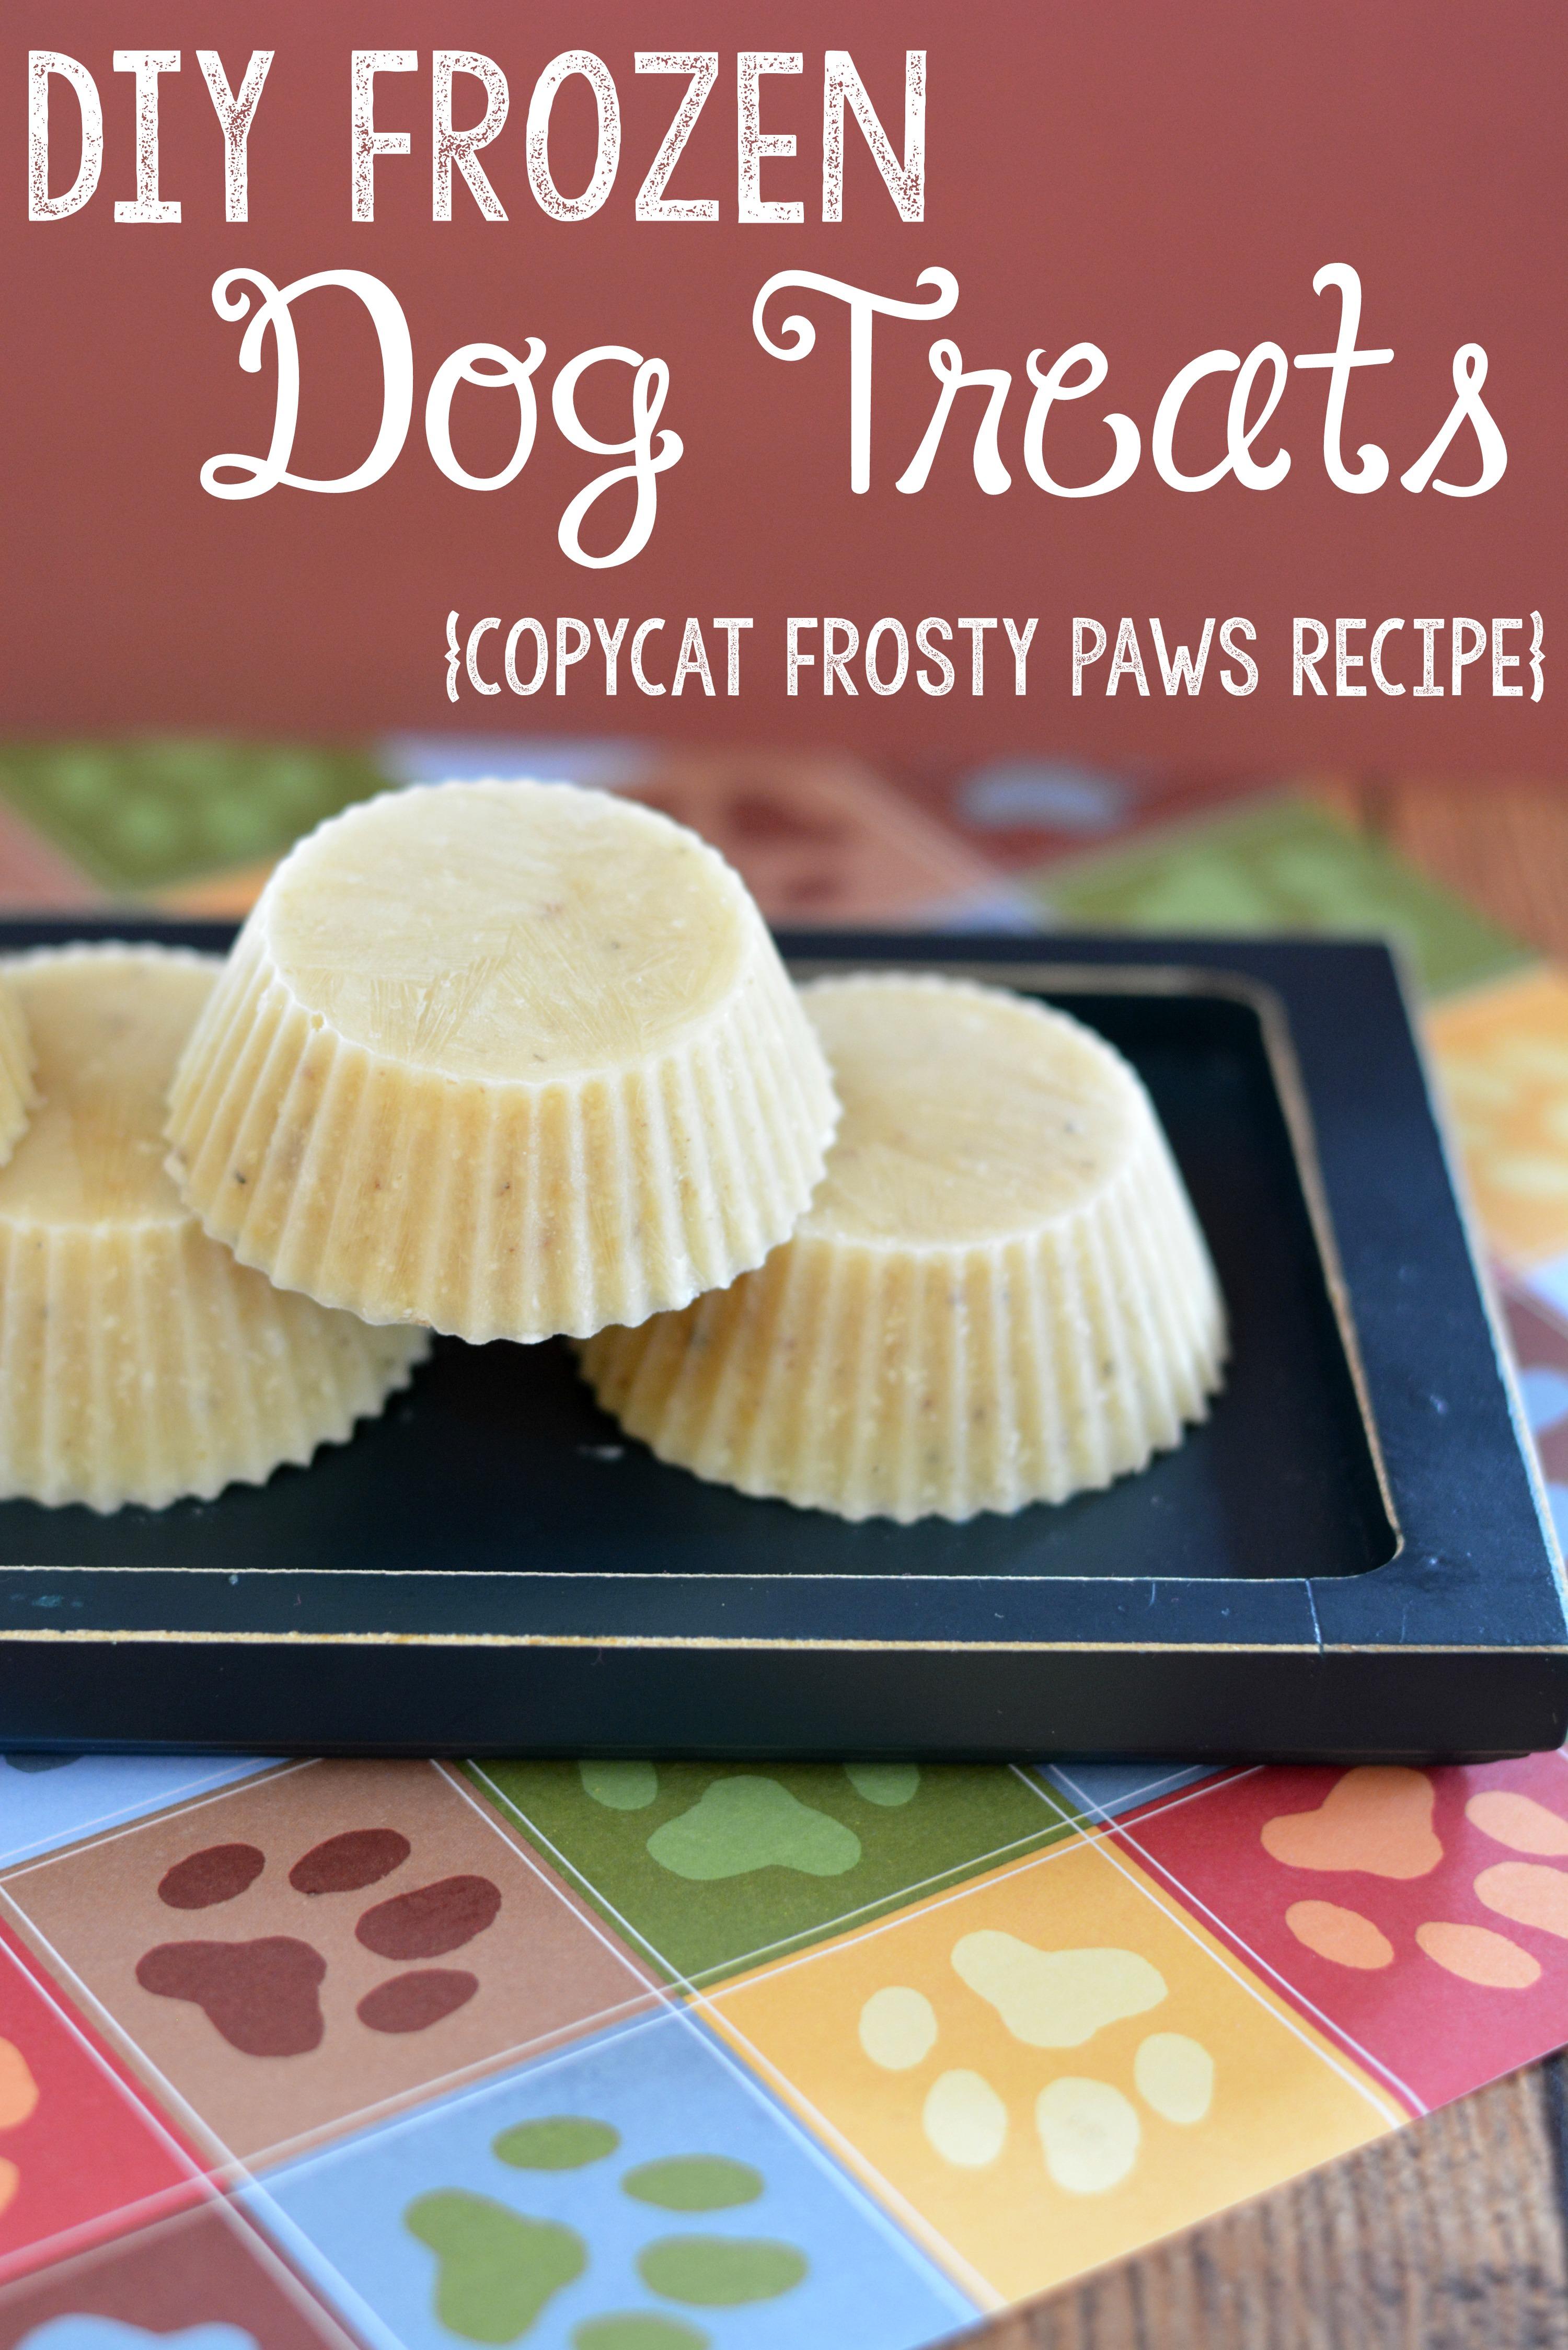 Diy Frosted Dog Treats Recipe Copycat Frosty Paws Recipe